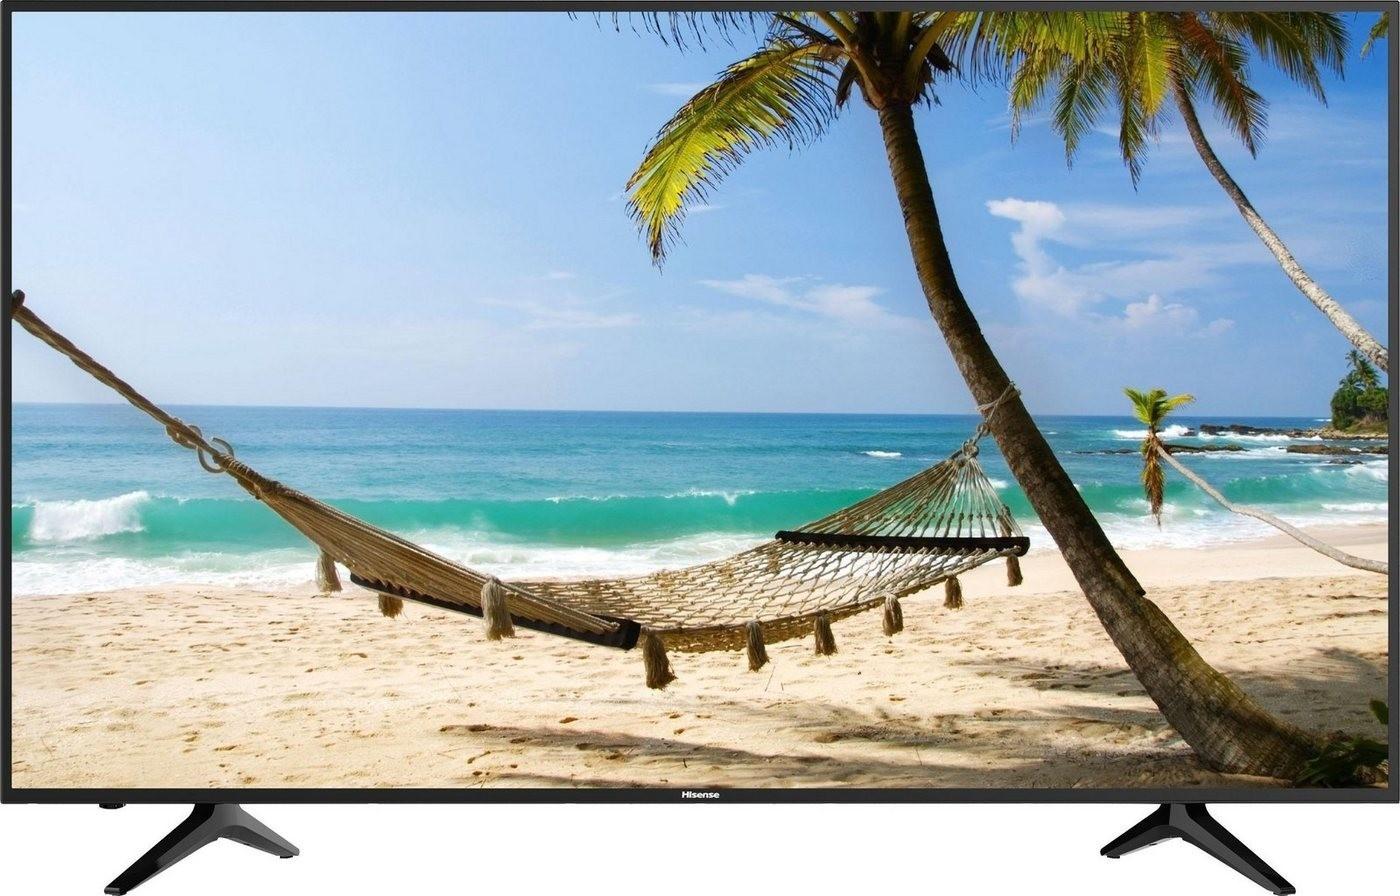 Hisense H50AE6030 50 Zoll UHD LED Fernseher (VA-Panel, Direct LED, 60 Hz, HDR10@8bit+FRC) [eBay Alternate & amazon] [299,70€ möglich ebay]